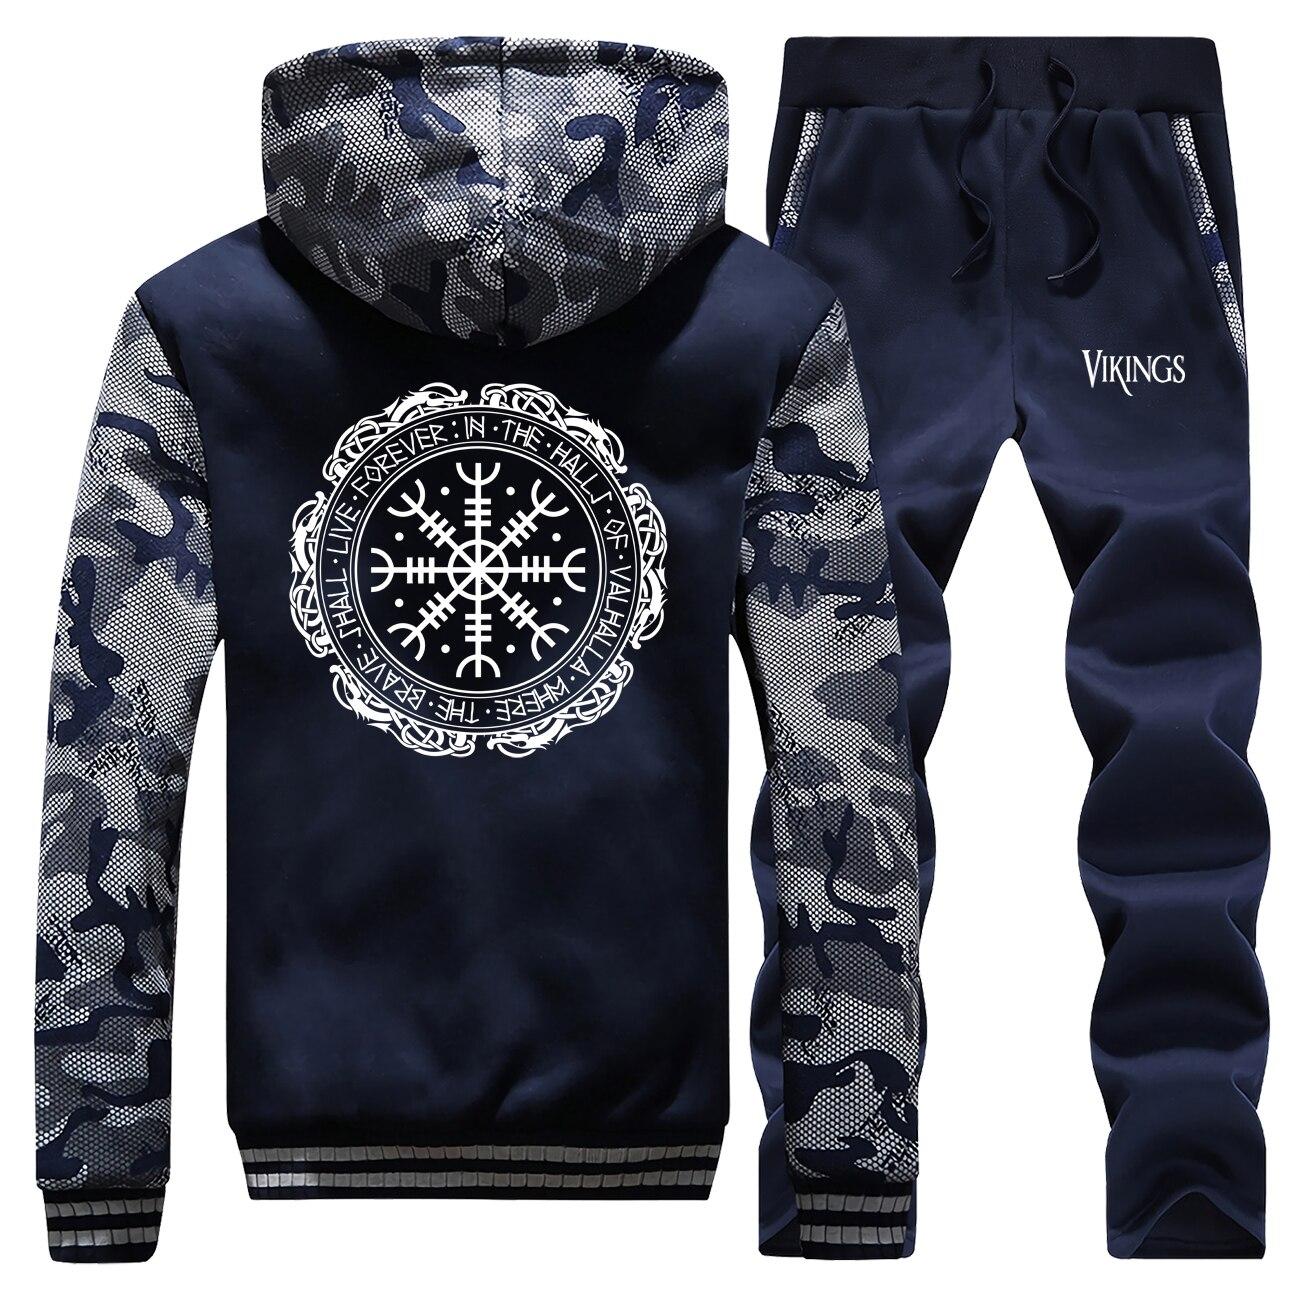 Viking Valhalla Odin Coat Camouflage Tracksuit Men Fashion Warm Thick Hoodies Sweatshirt Suit Winter Jacket+Pants 2 Piece Sets